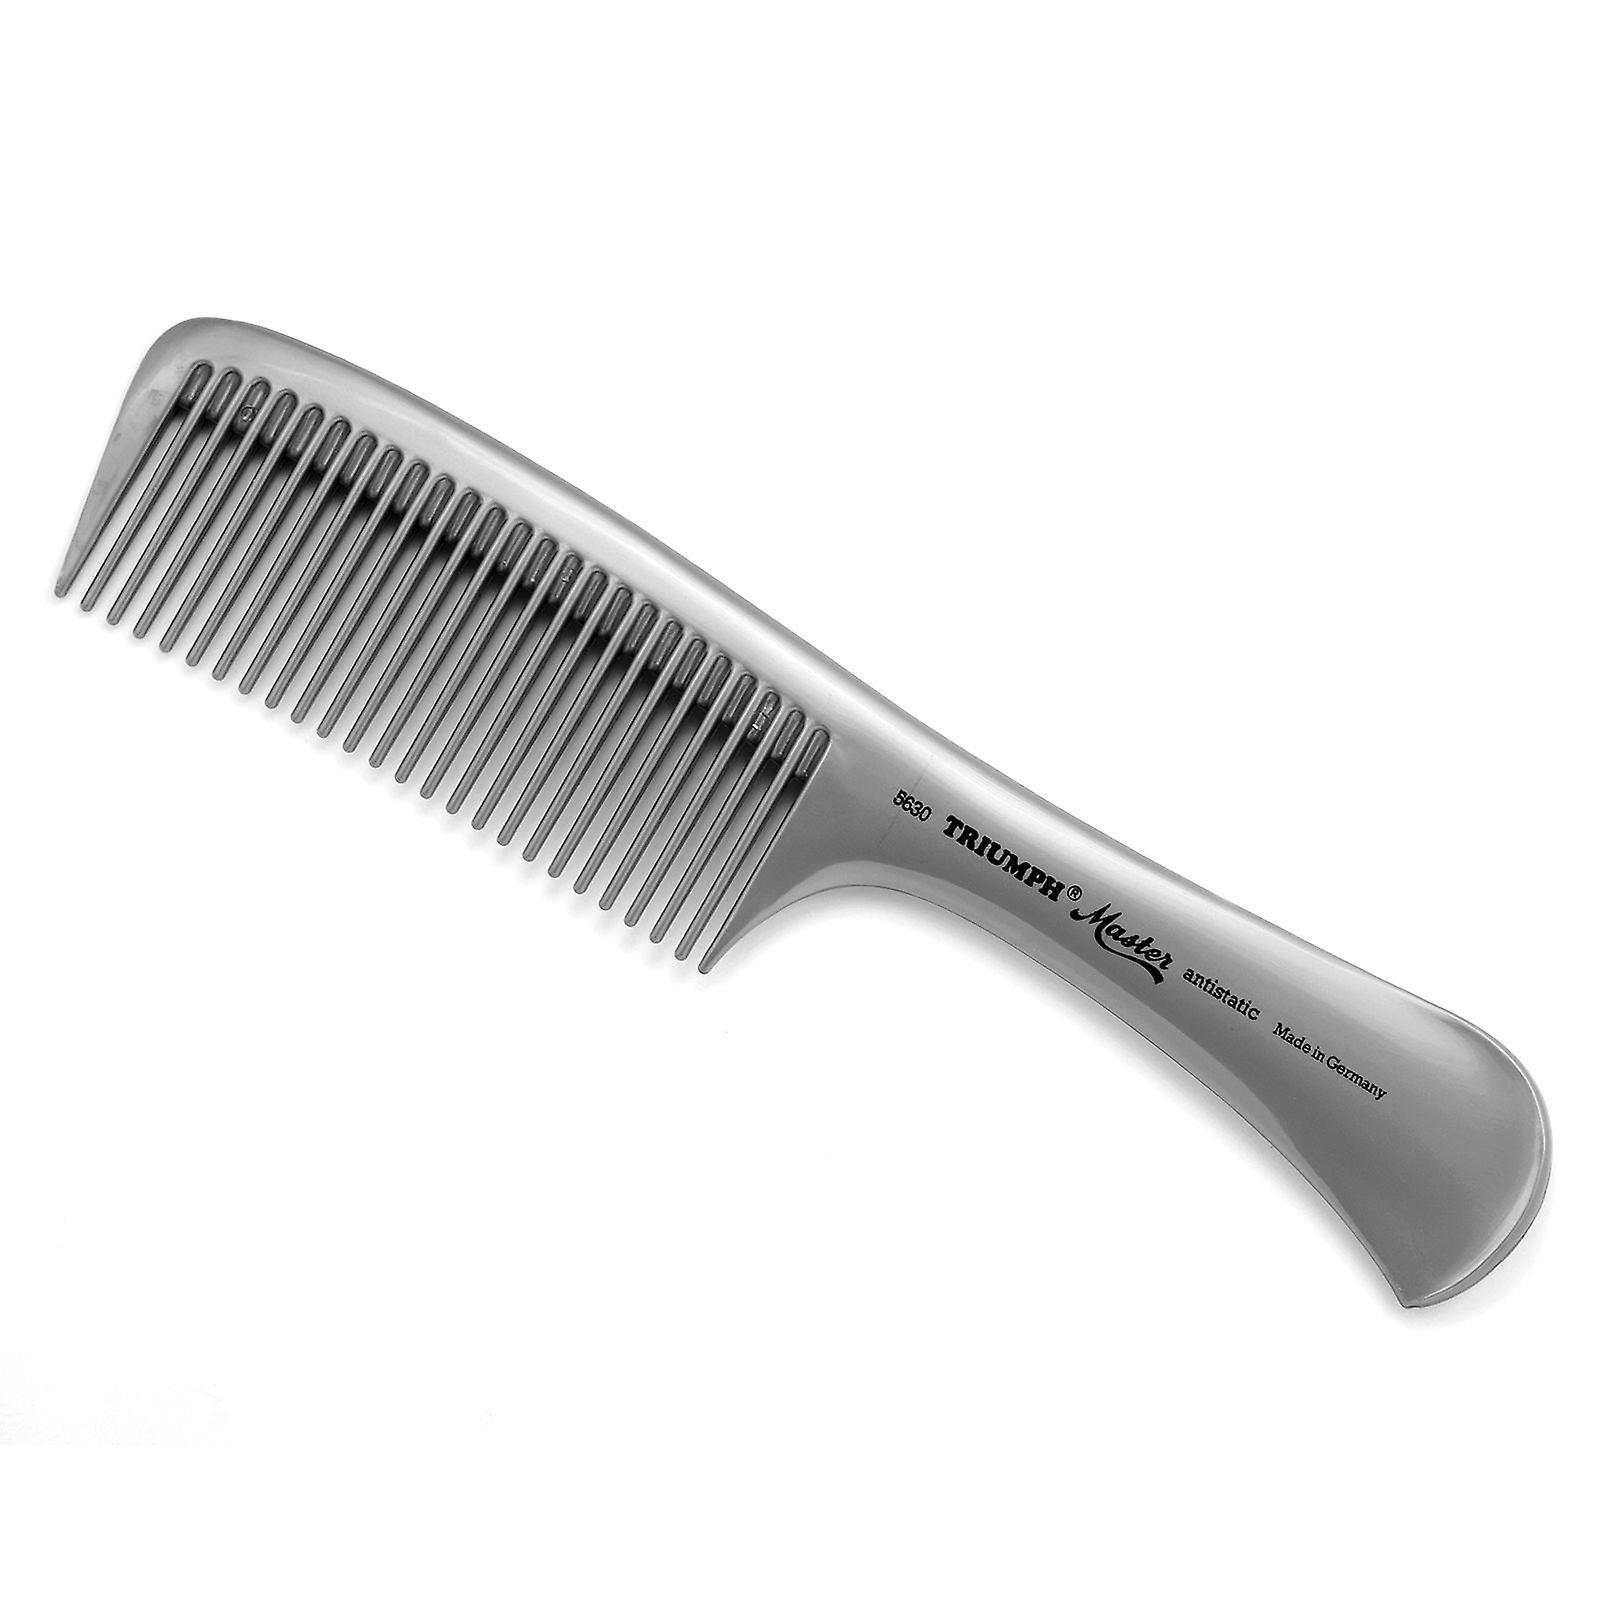 Triumph Master handle comb HS-5630 95